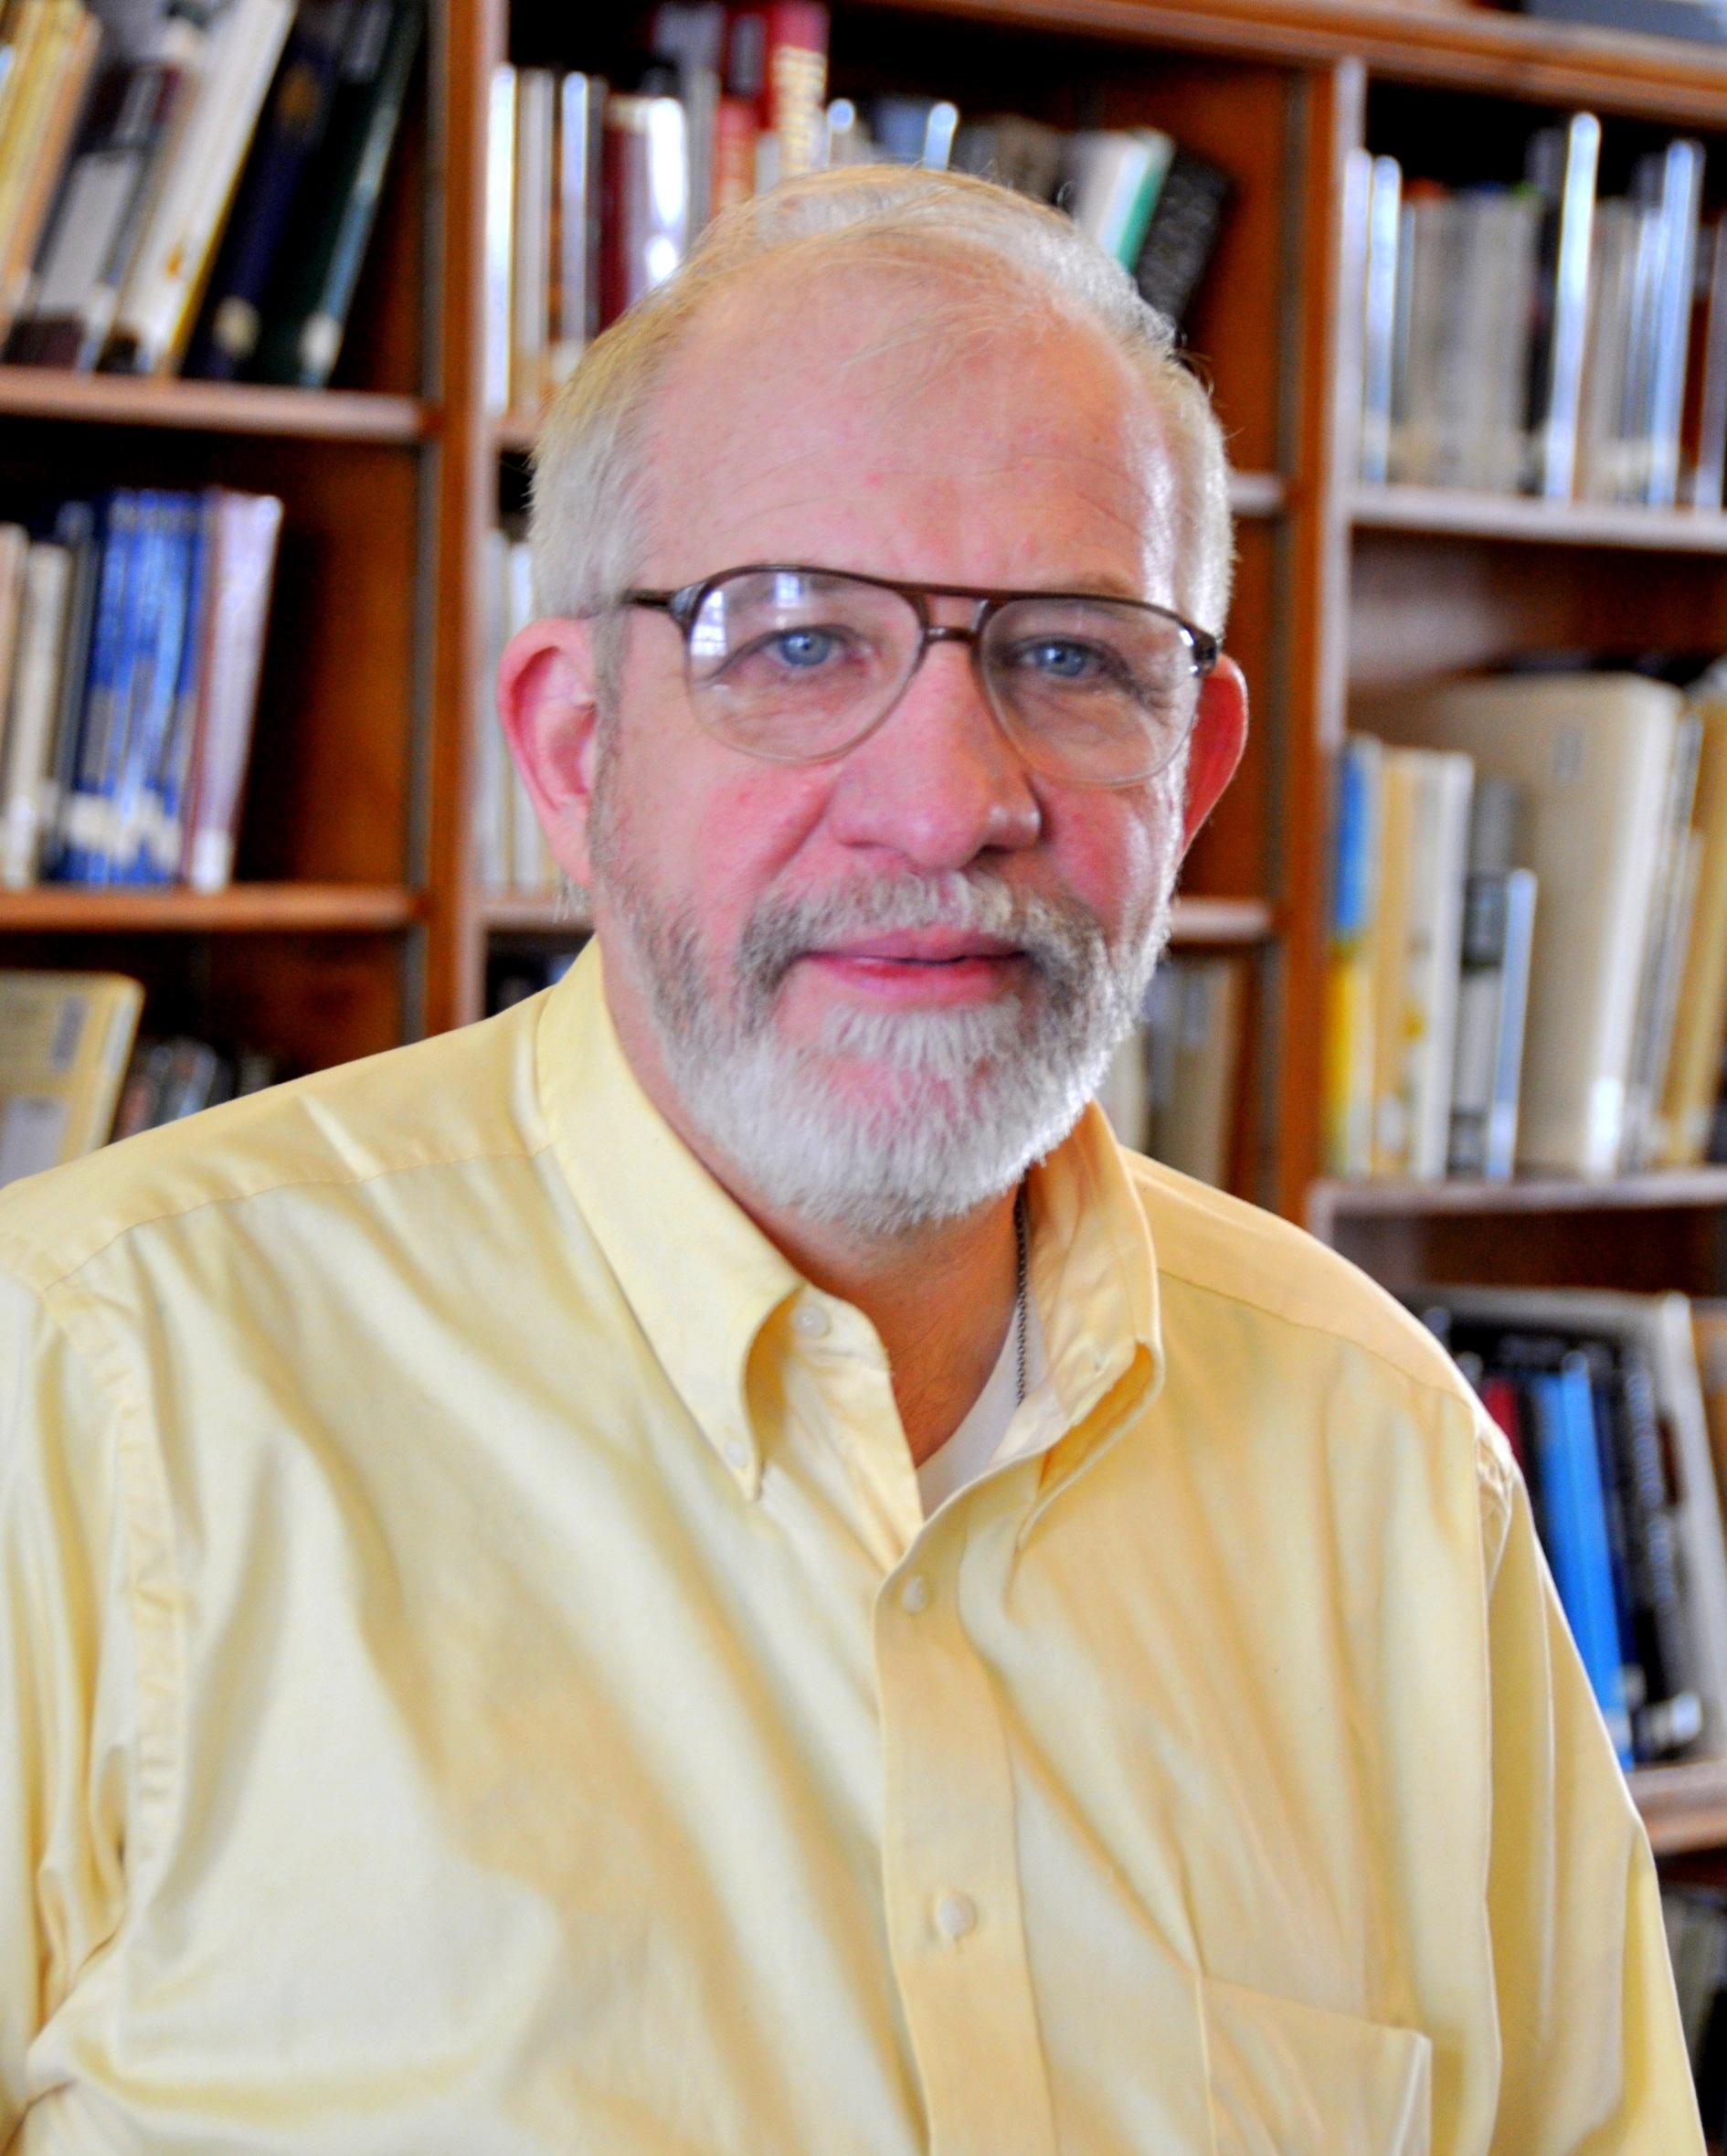 Mike Splaine